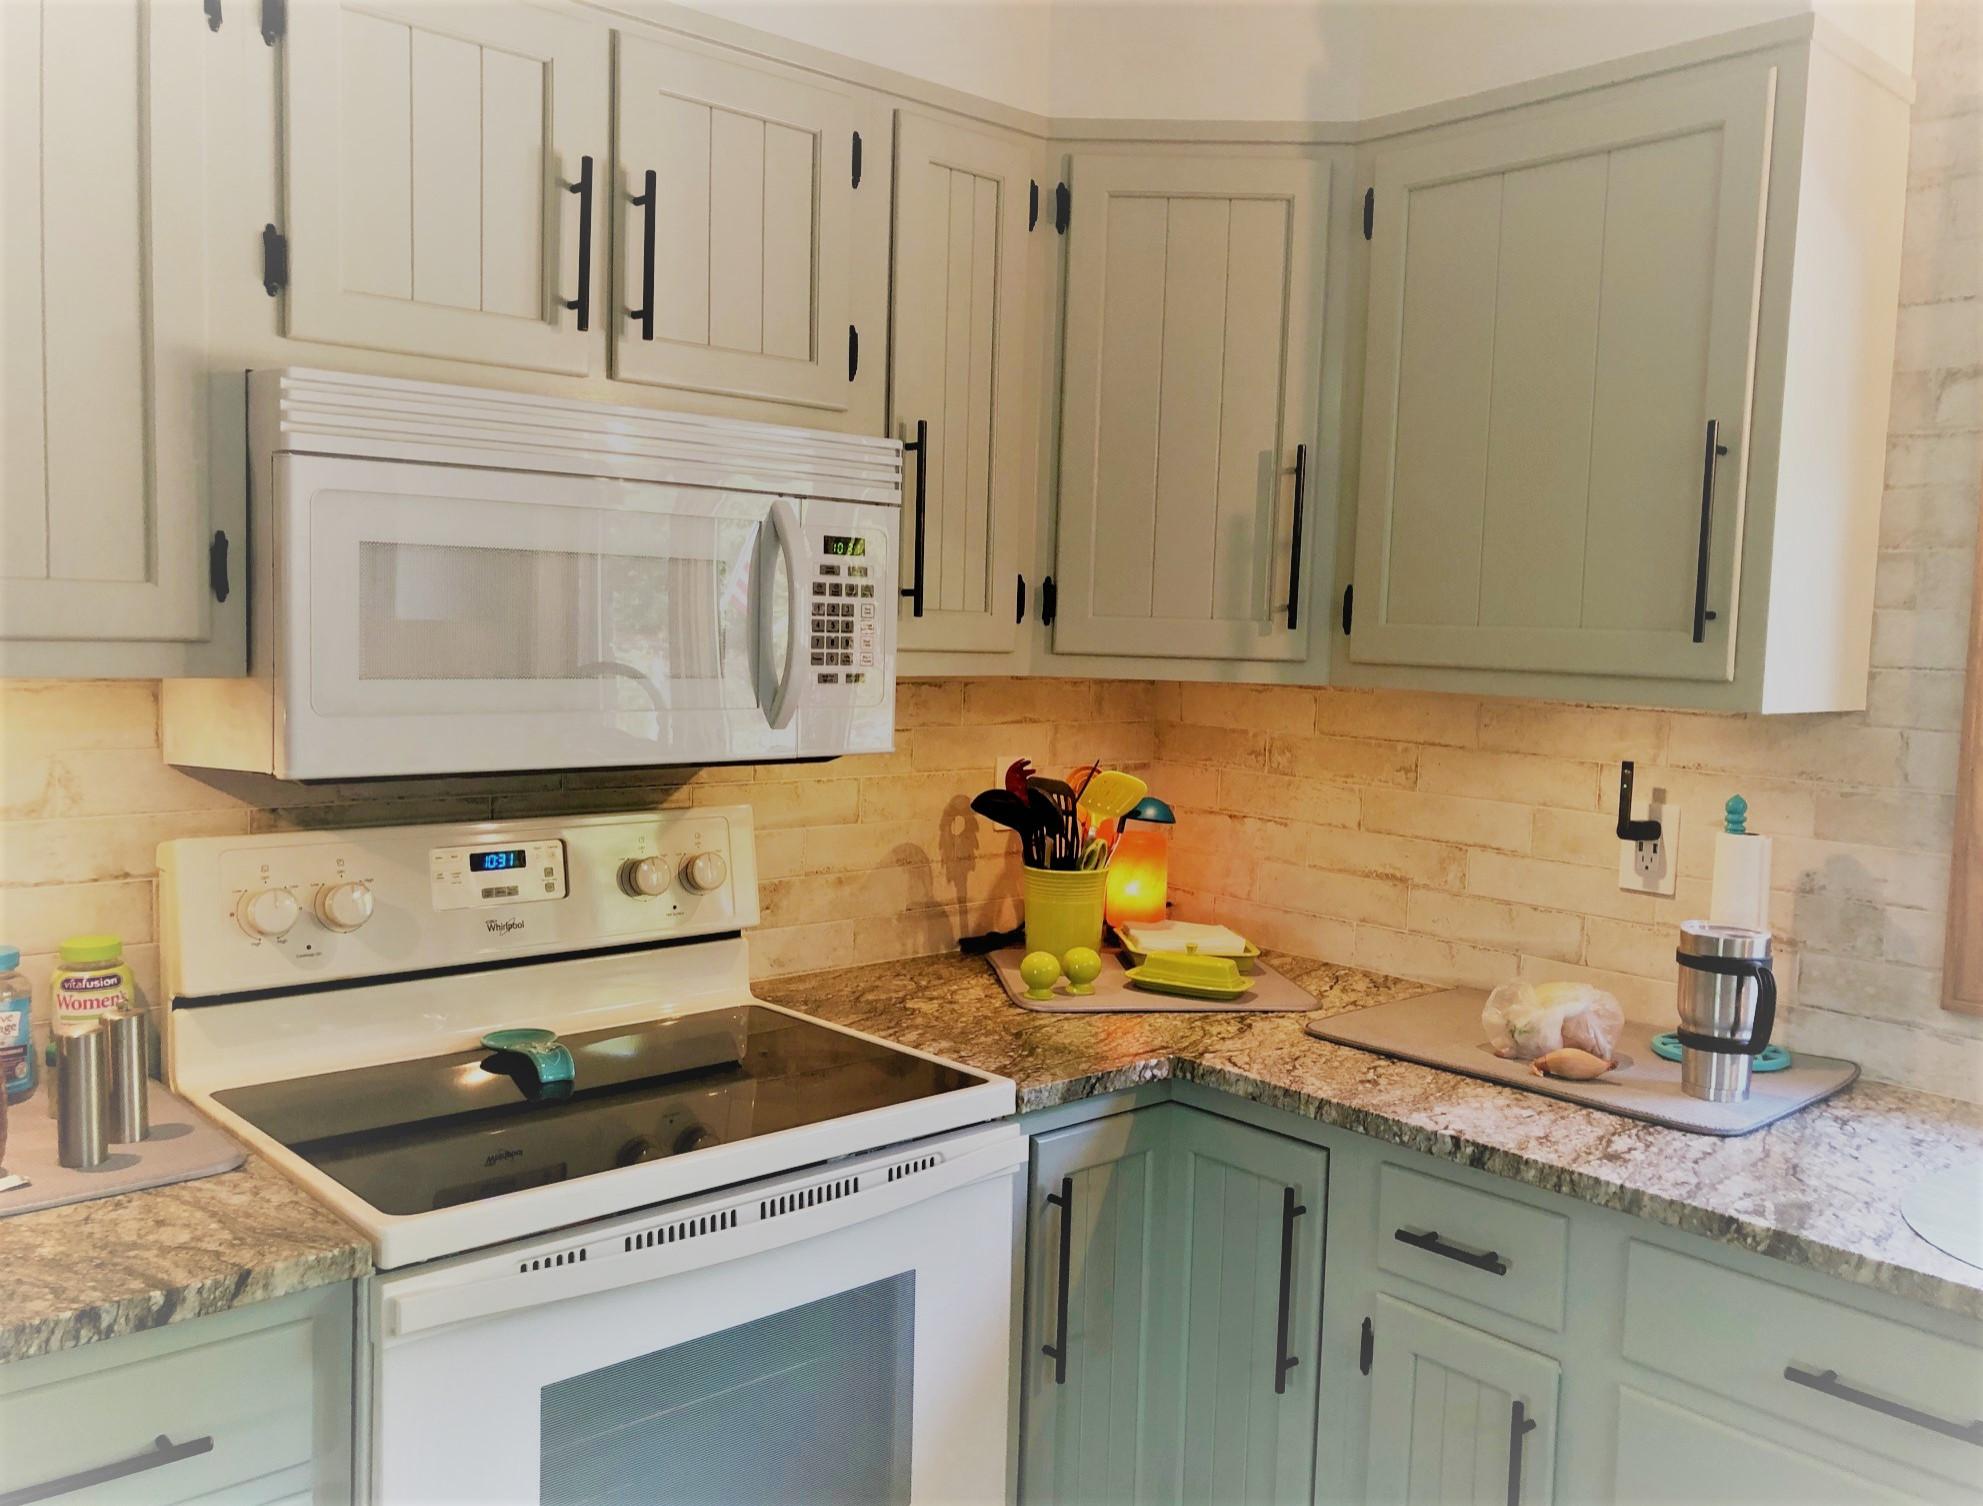 Sheckler home renovation